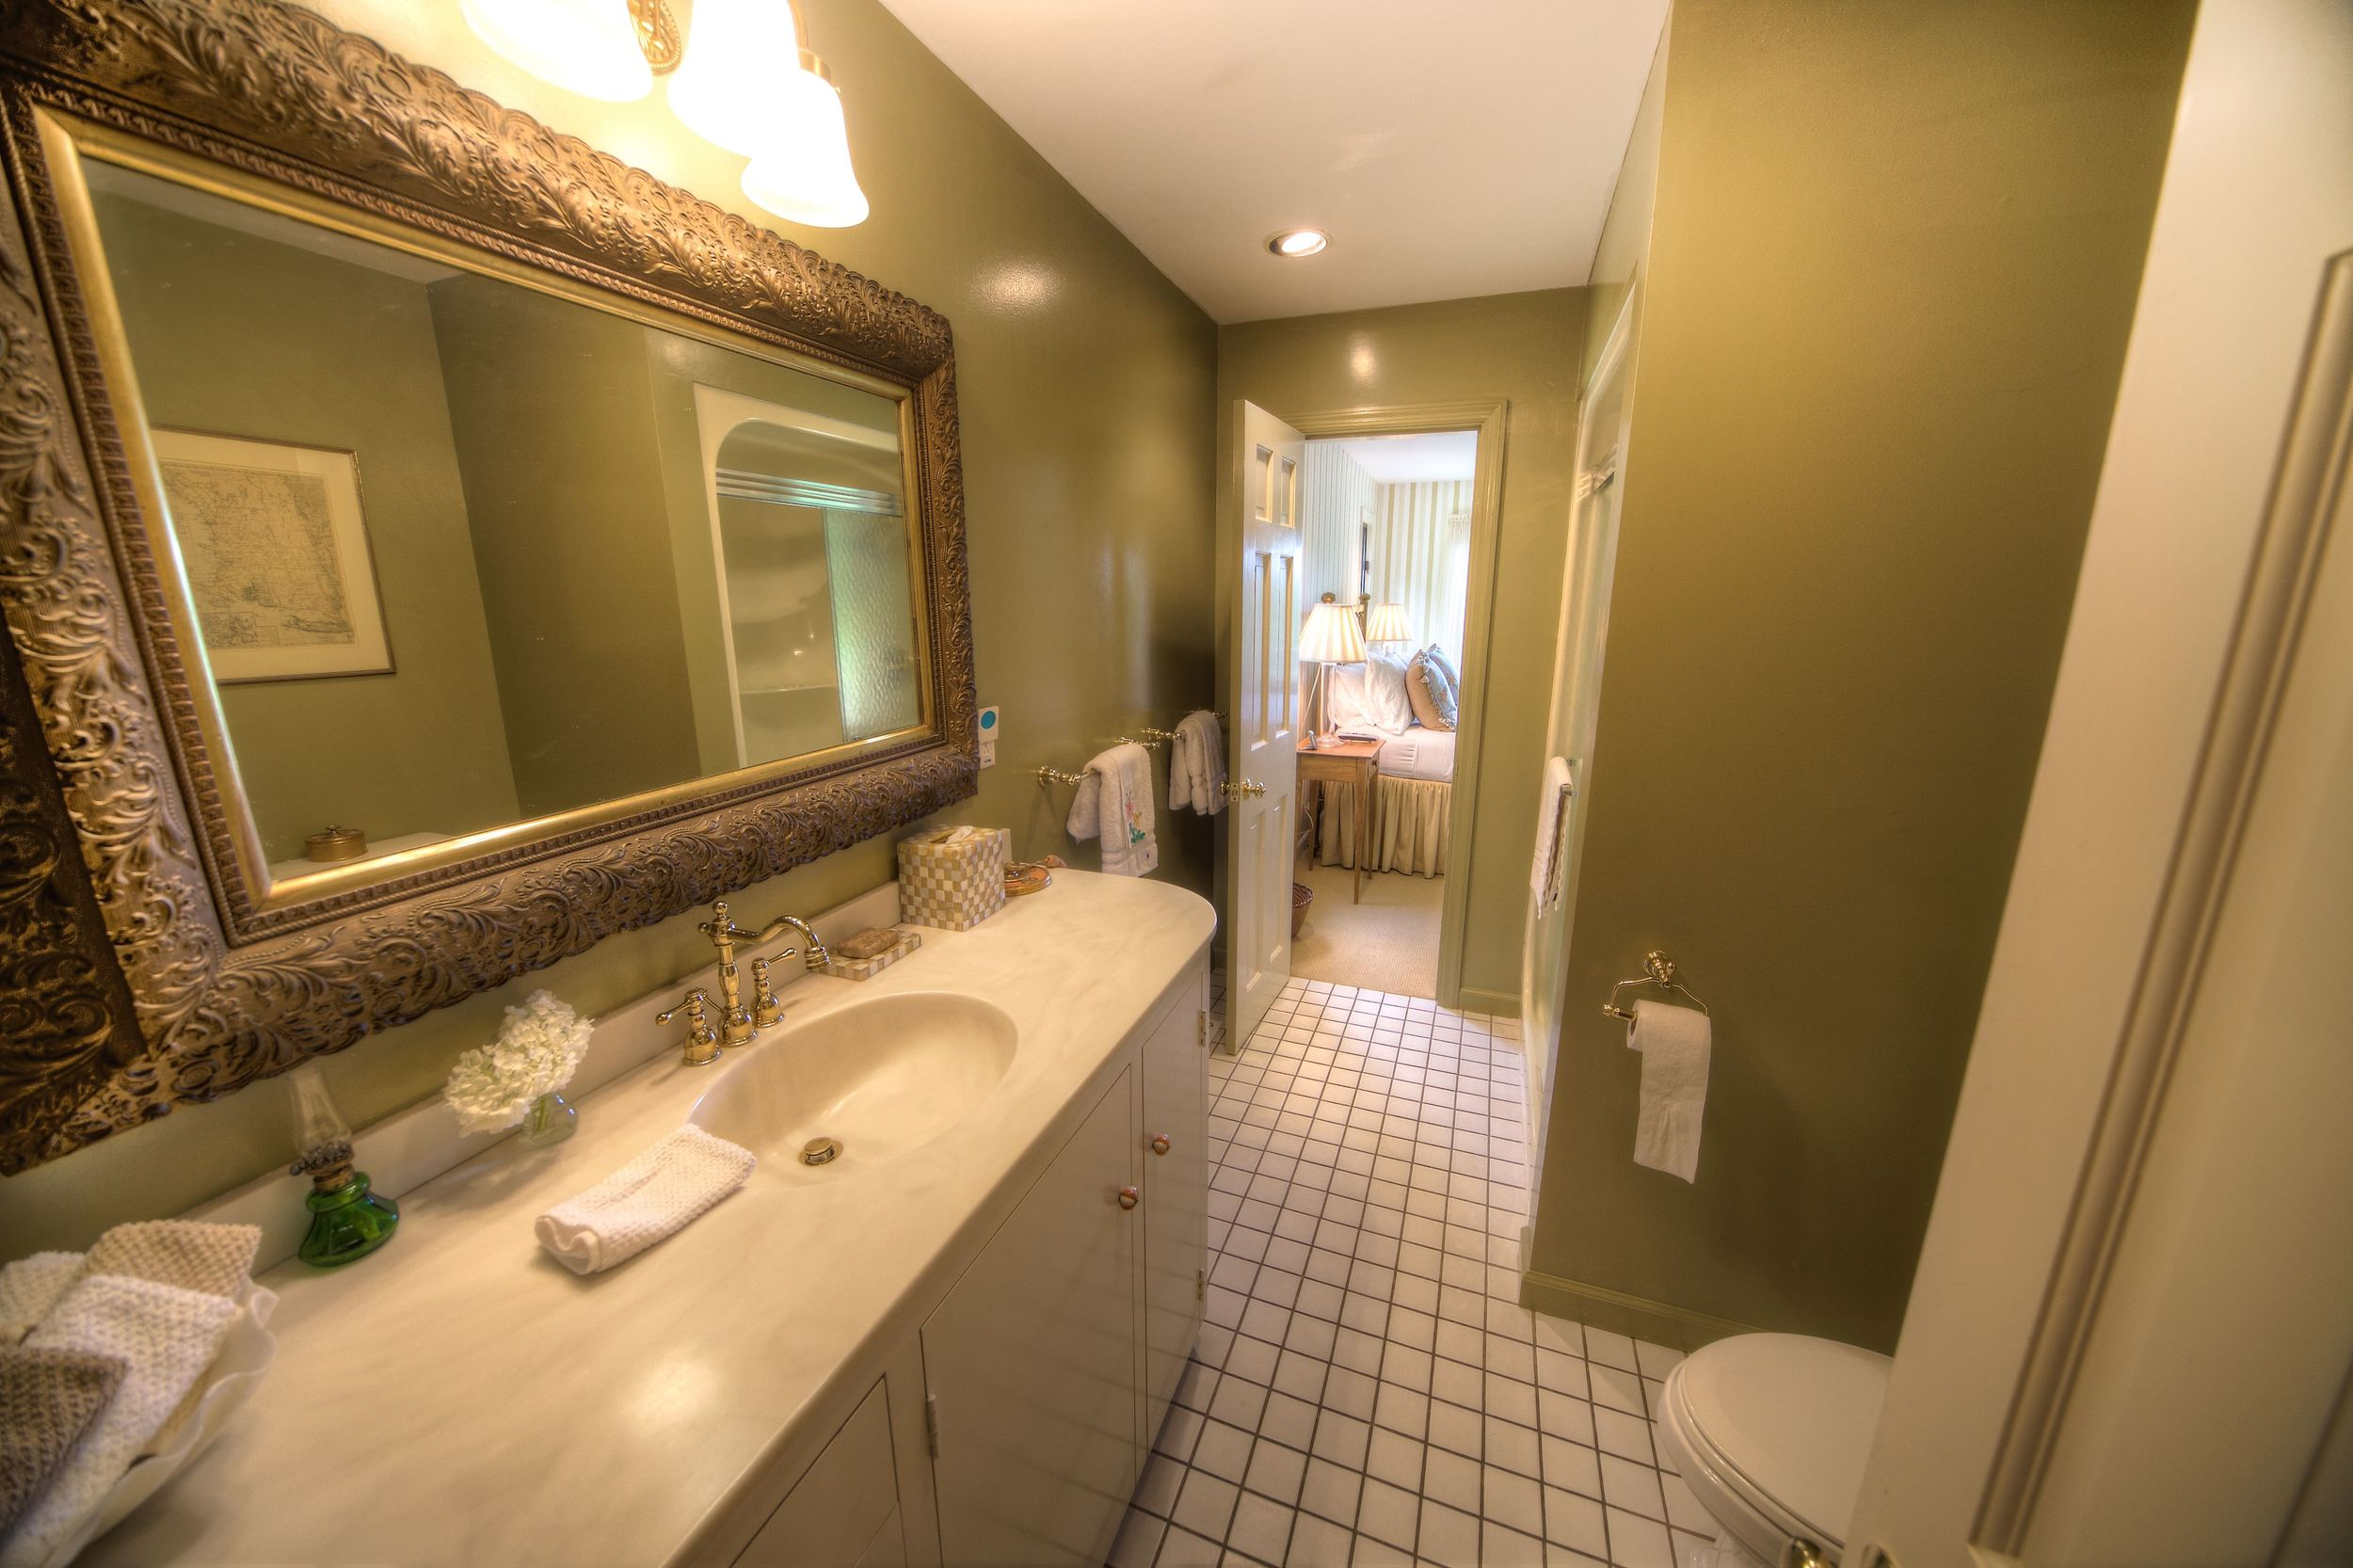 Bathroom1Test.jpg